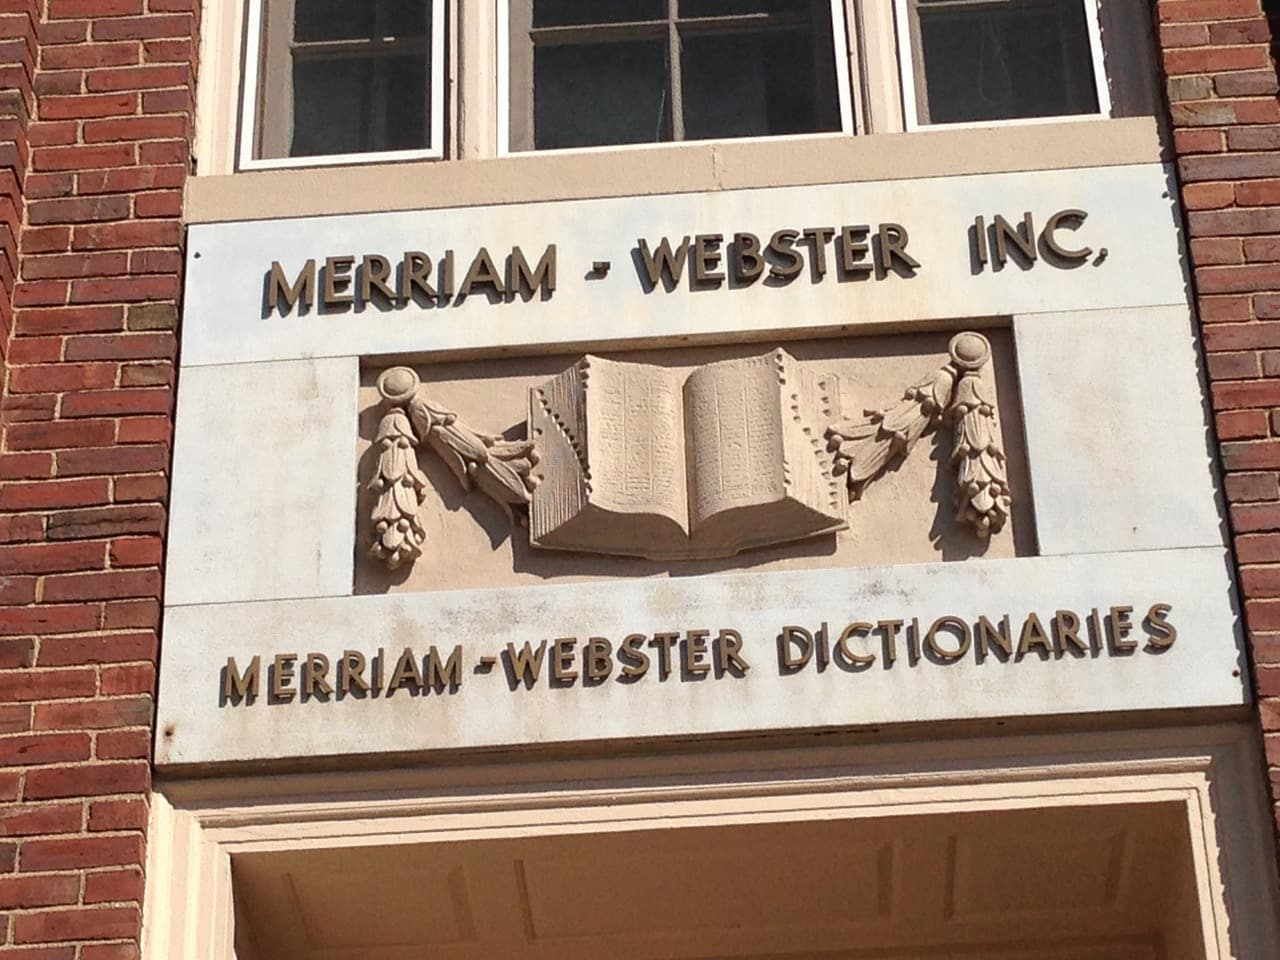 Merriam-Webster, Springfield Massachusetts